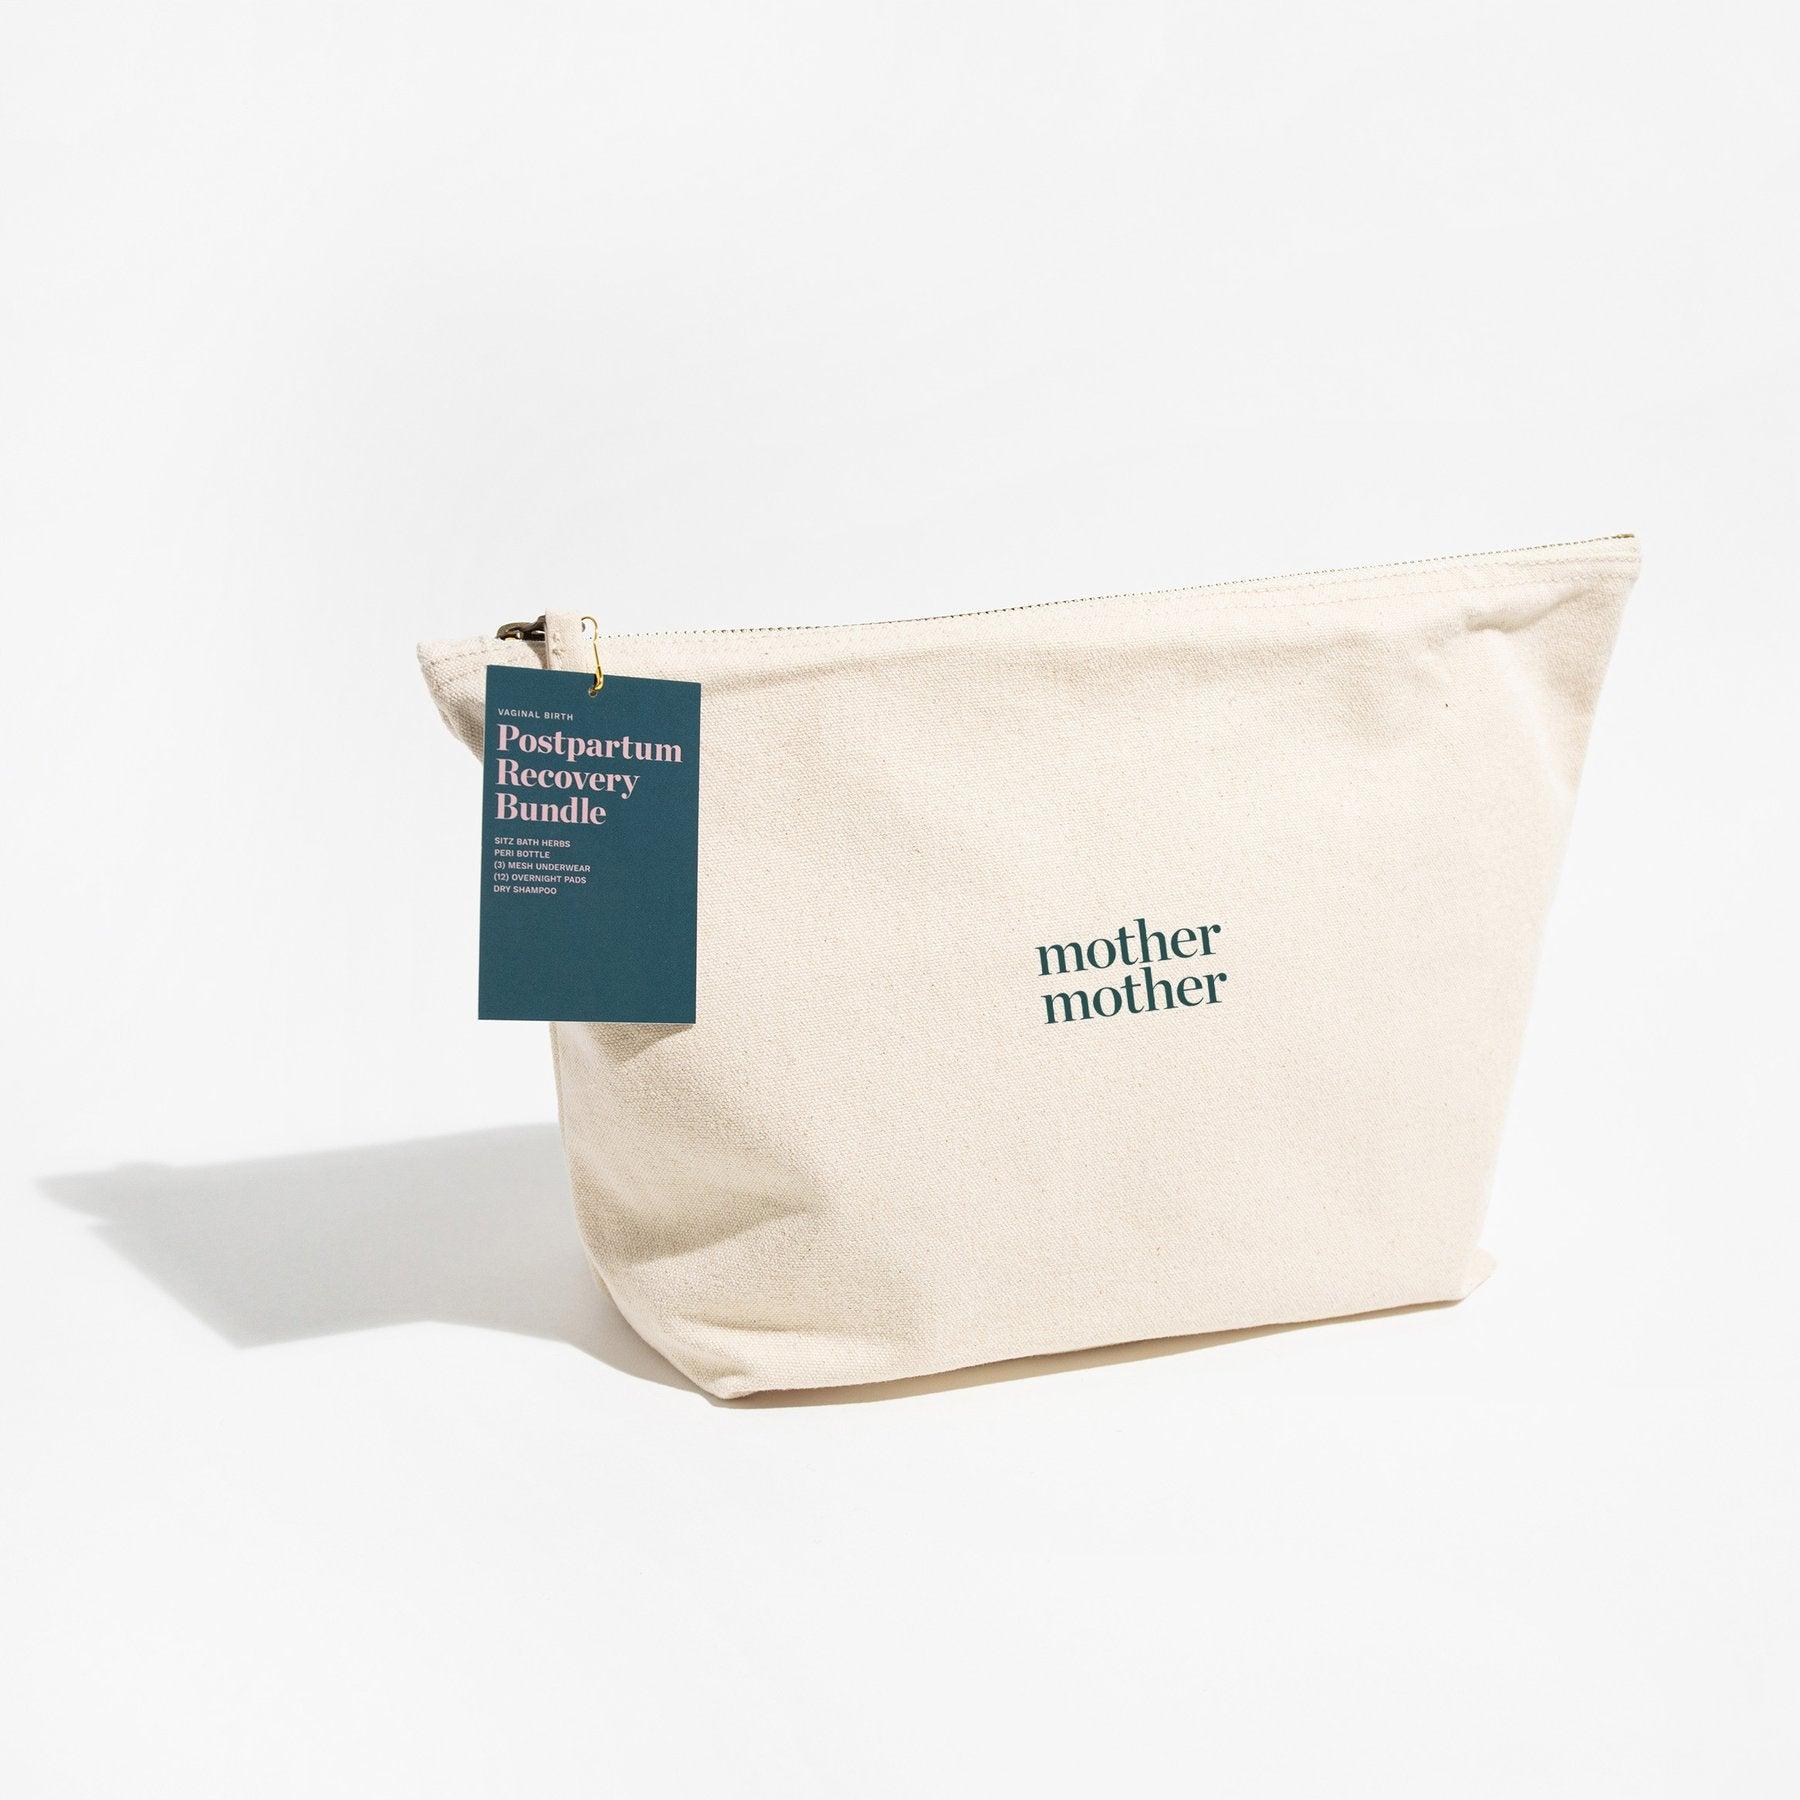 Best Gift Baskets Option: Postpartum Recovery Bundle